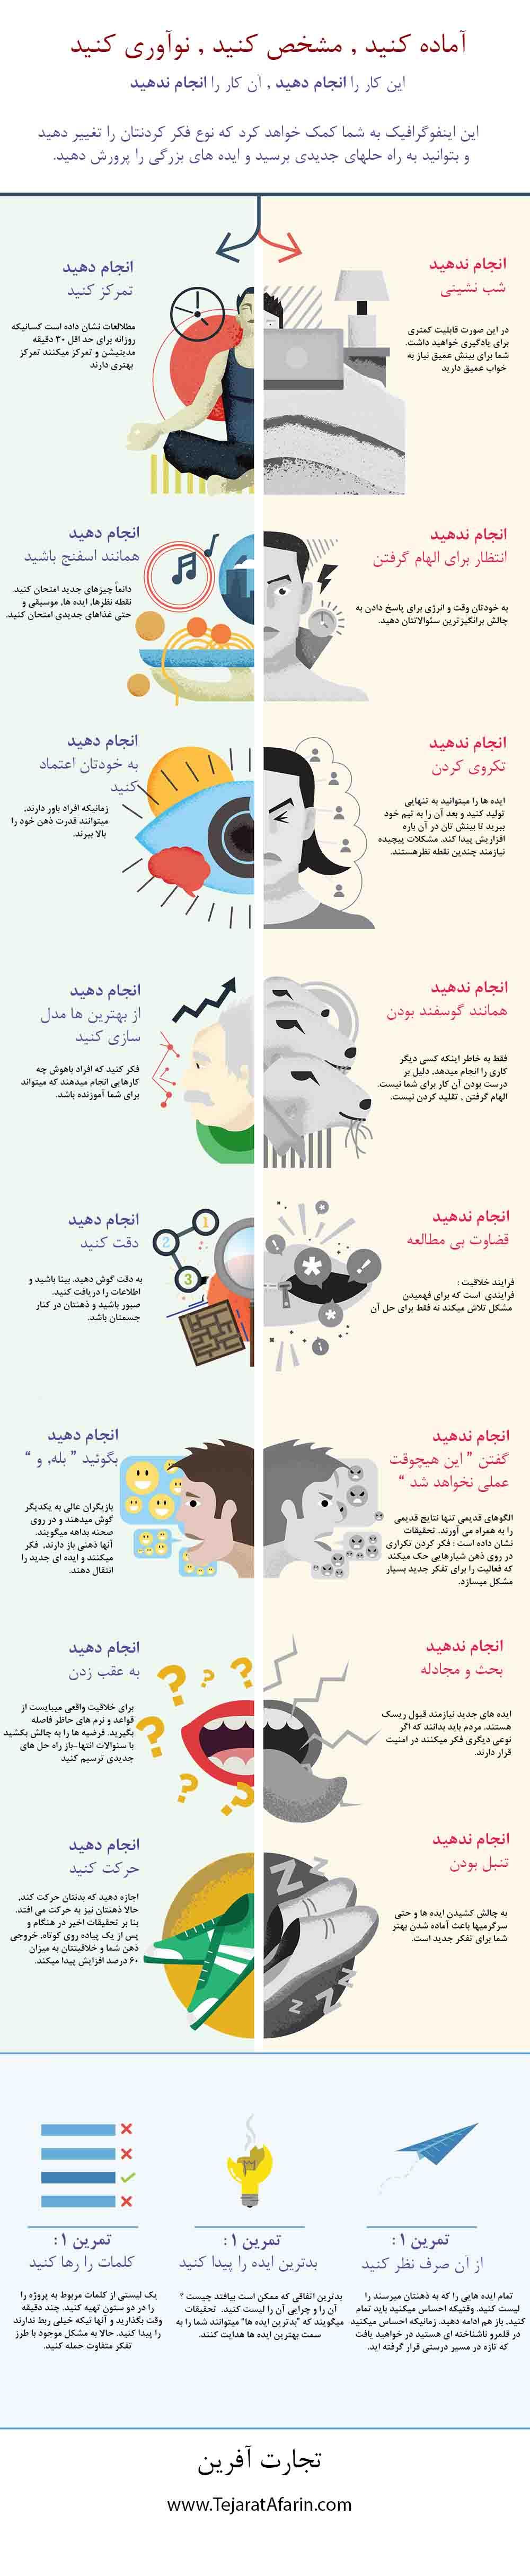 TejaratAfarin Infographic 1.2